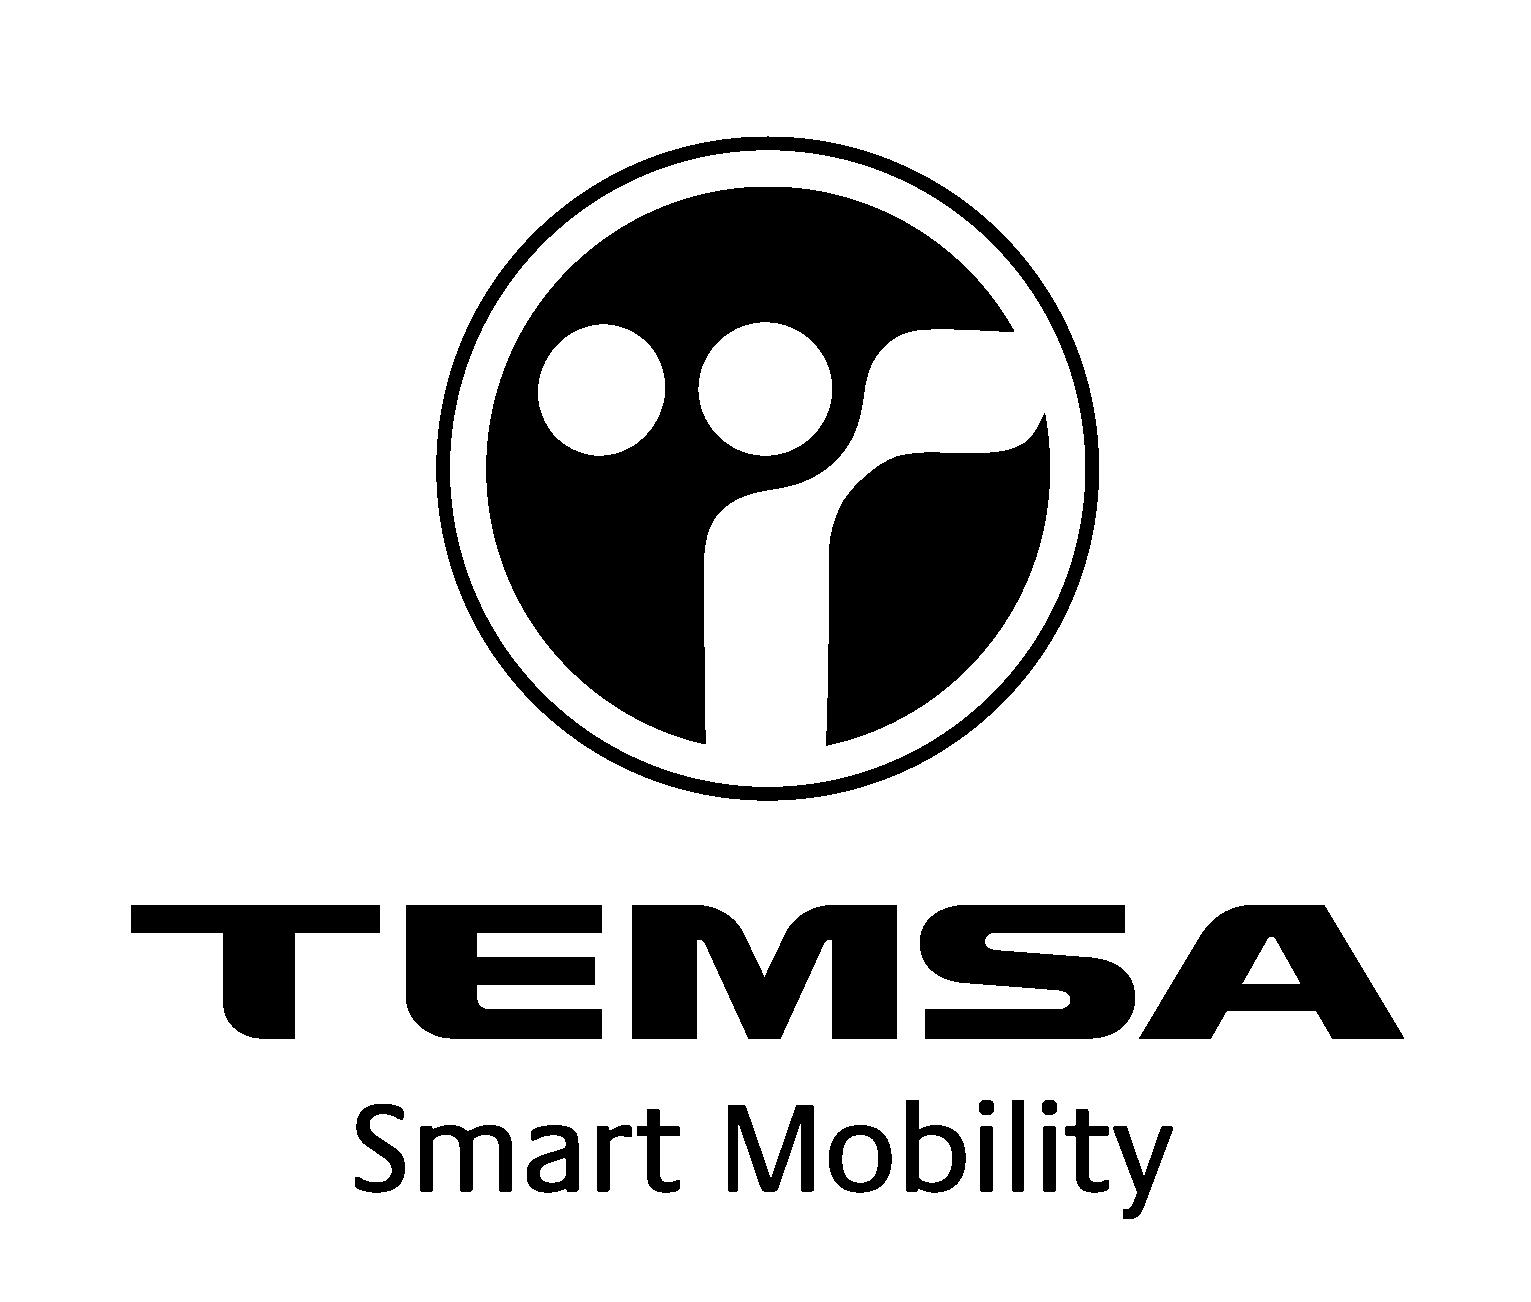 TEMSA